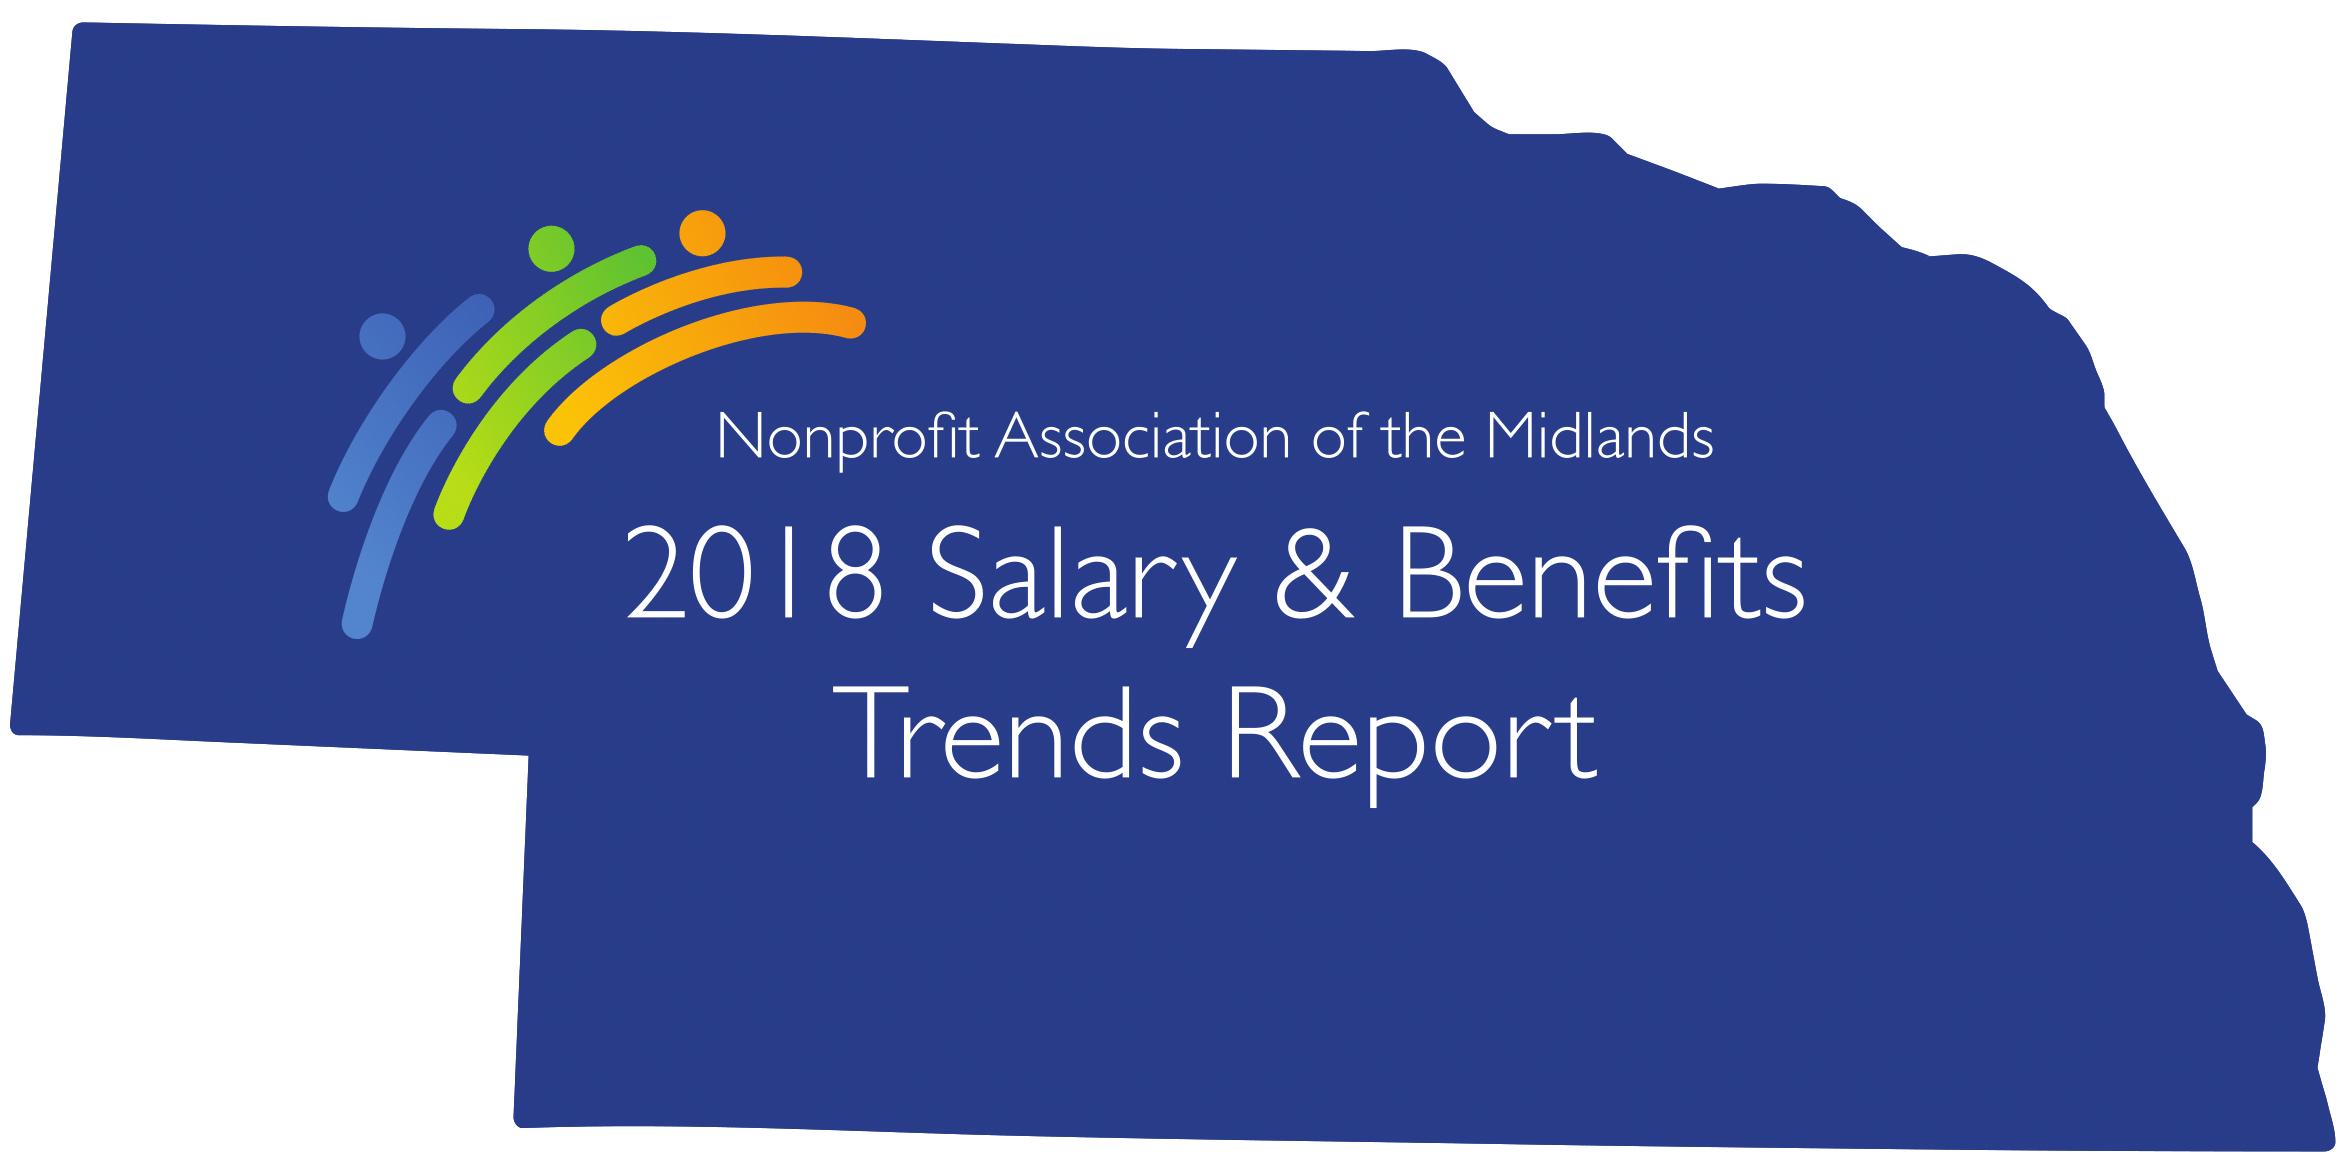 Salary Benefit Survey 2018 Nonprofit Association Of The Midlands